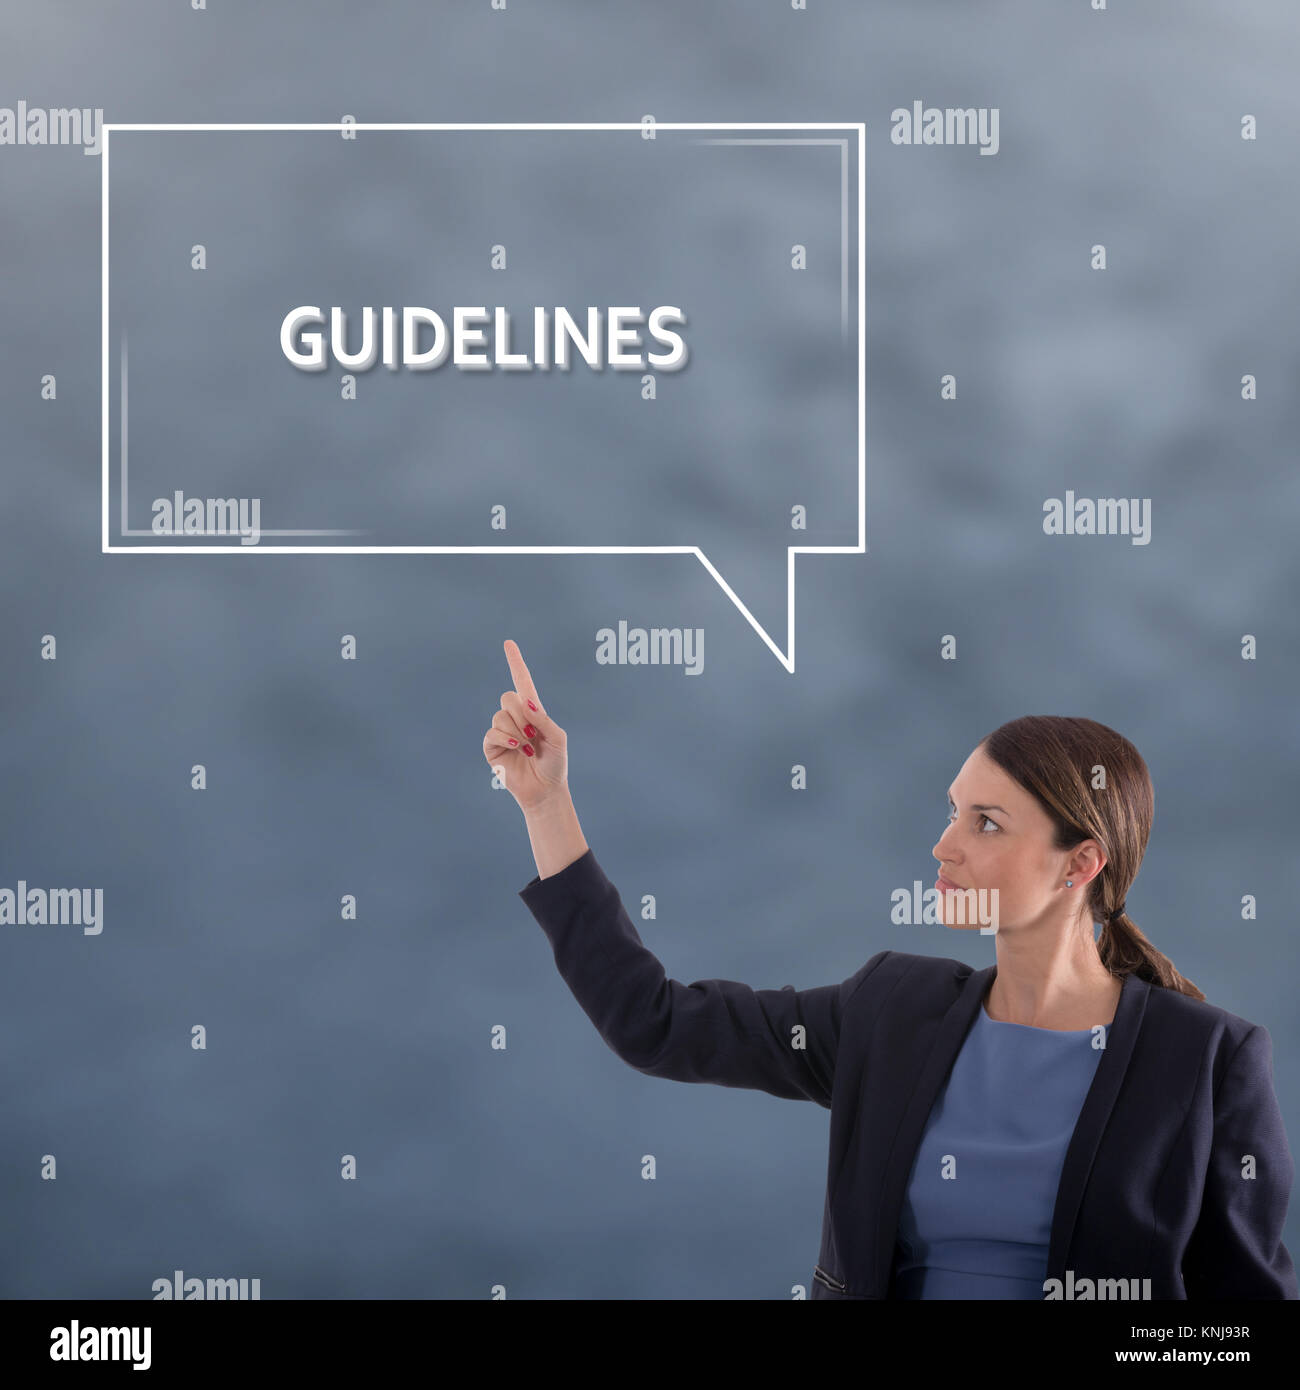 Directrices concepto empresarial. Mujer de negocios Concepto Gráfico Imagen De Stock